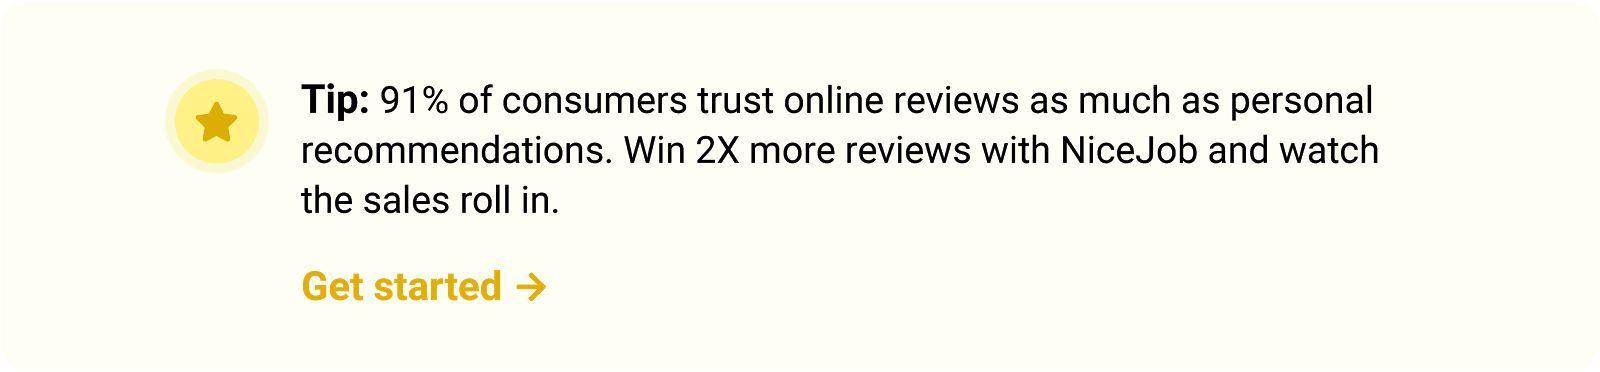 Get more customer reviews using NiceJob's reputation marketing software.